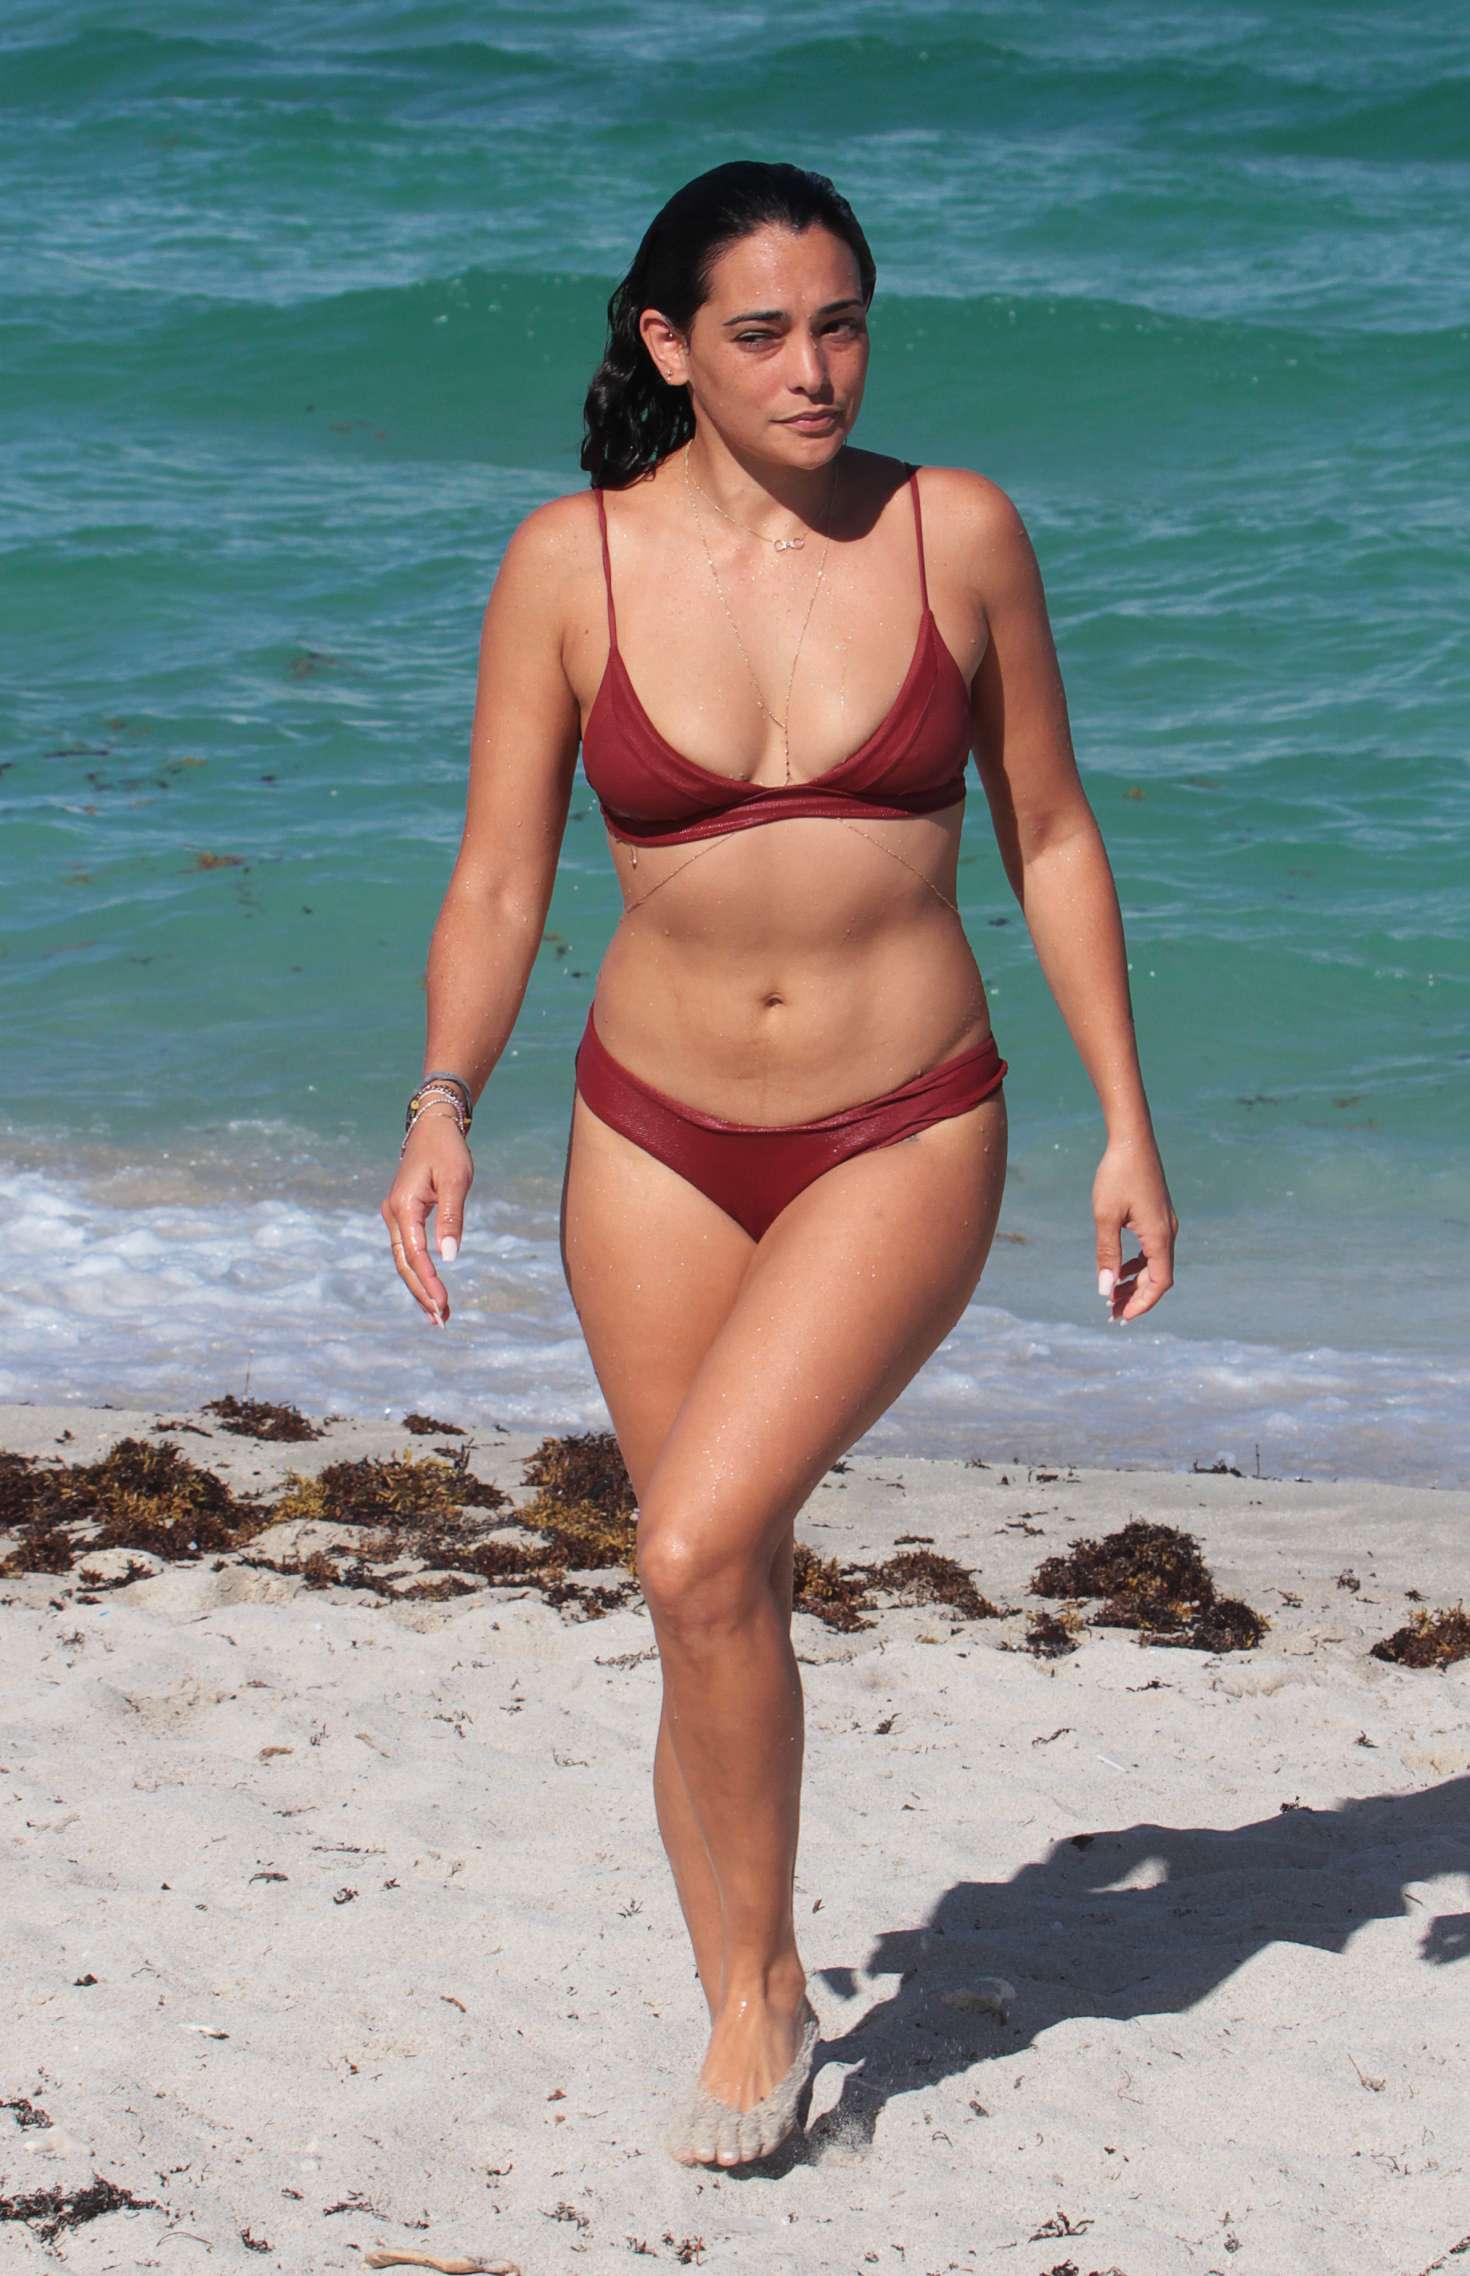 Miranda Kerr Nude is the Greatest Thing on Earth - 90 PICS Sex pics REDDIT Jenilee Harrison,Coco rocha close up